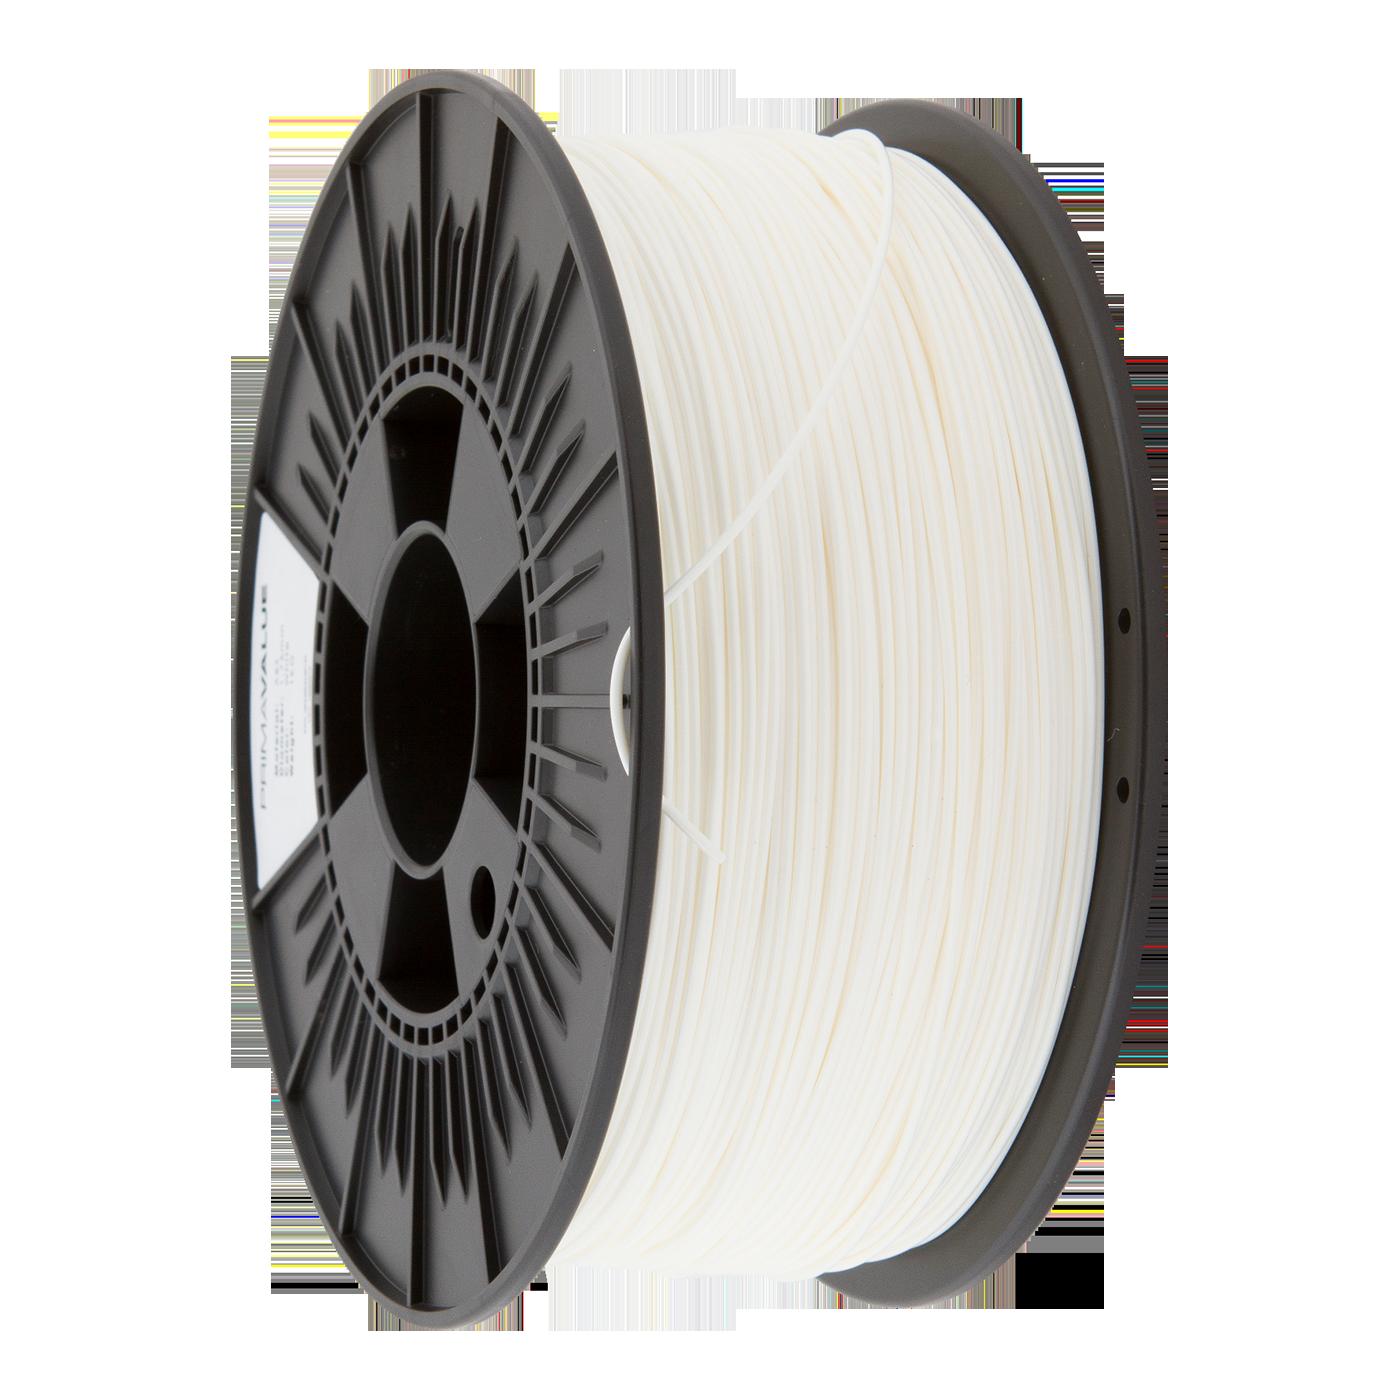 PrimaValue ABS Filament - 1.75mm - 1 kg spool - Vit